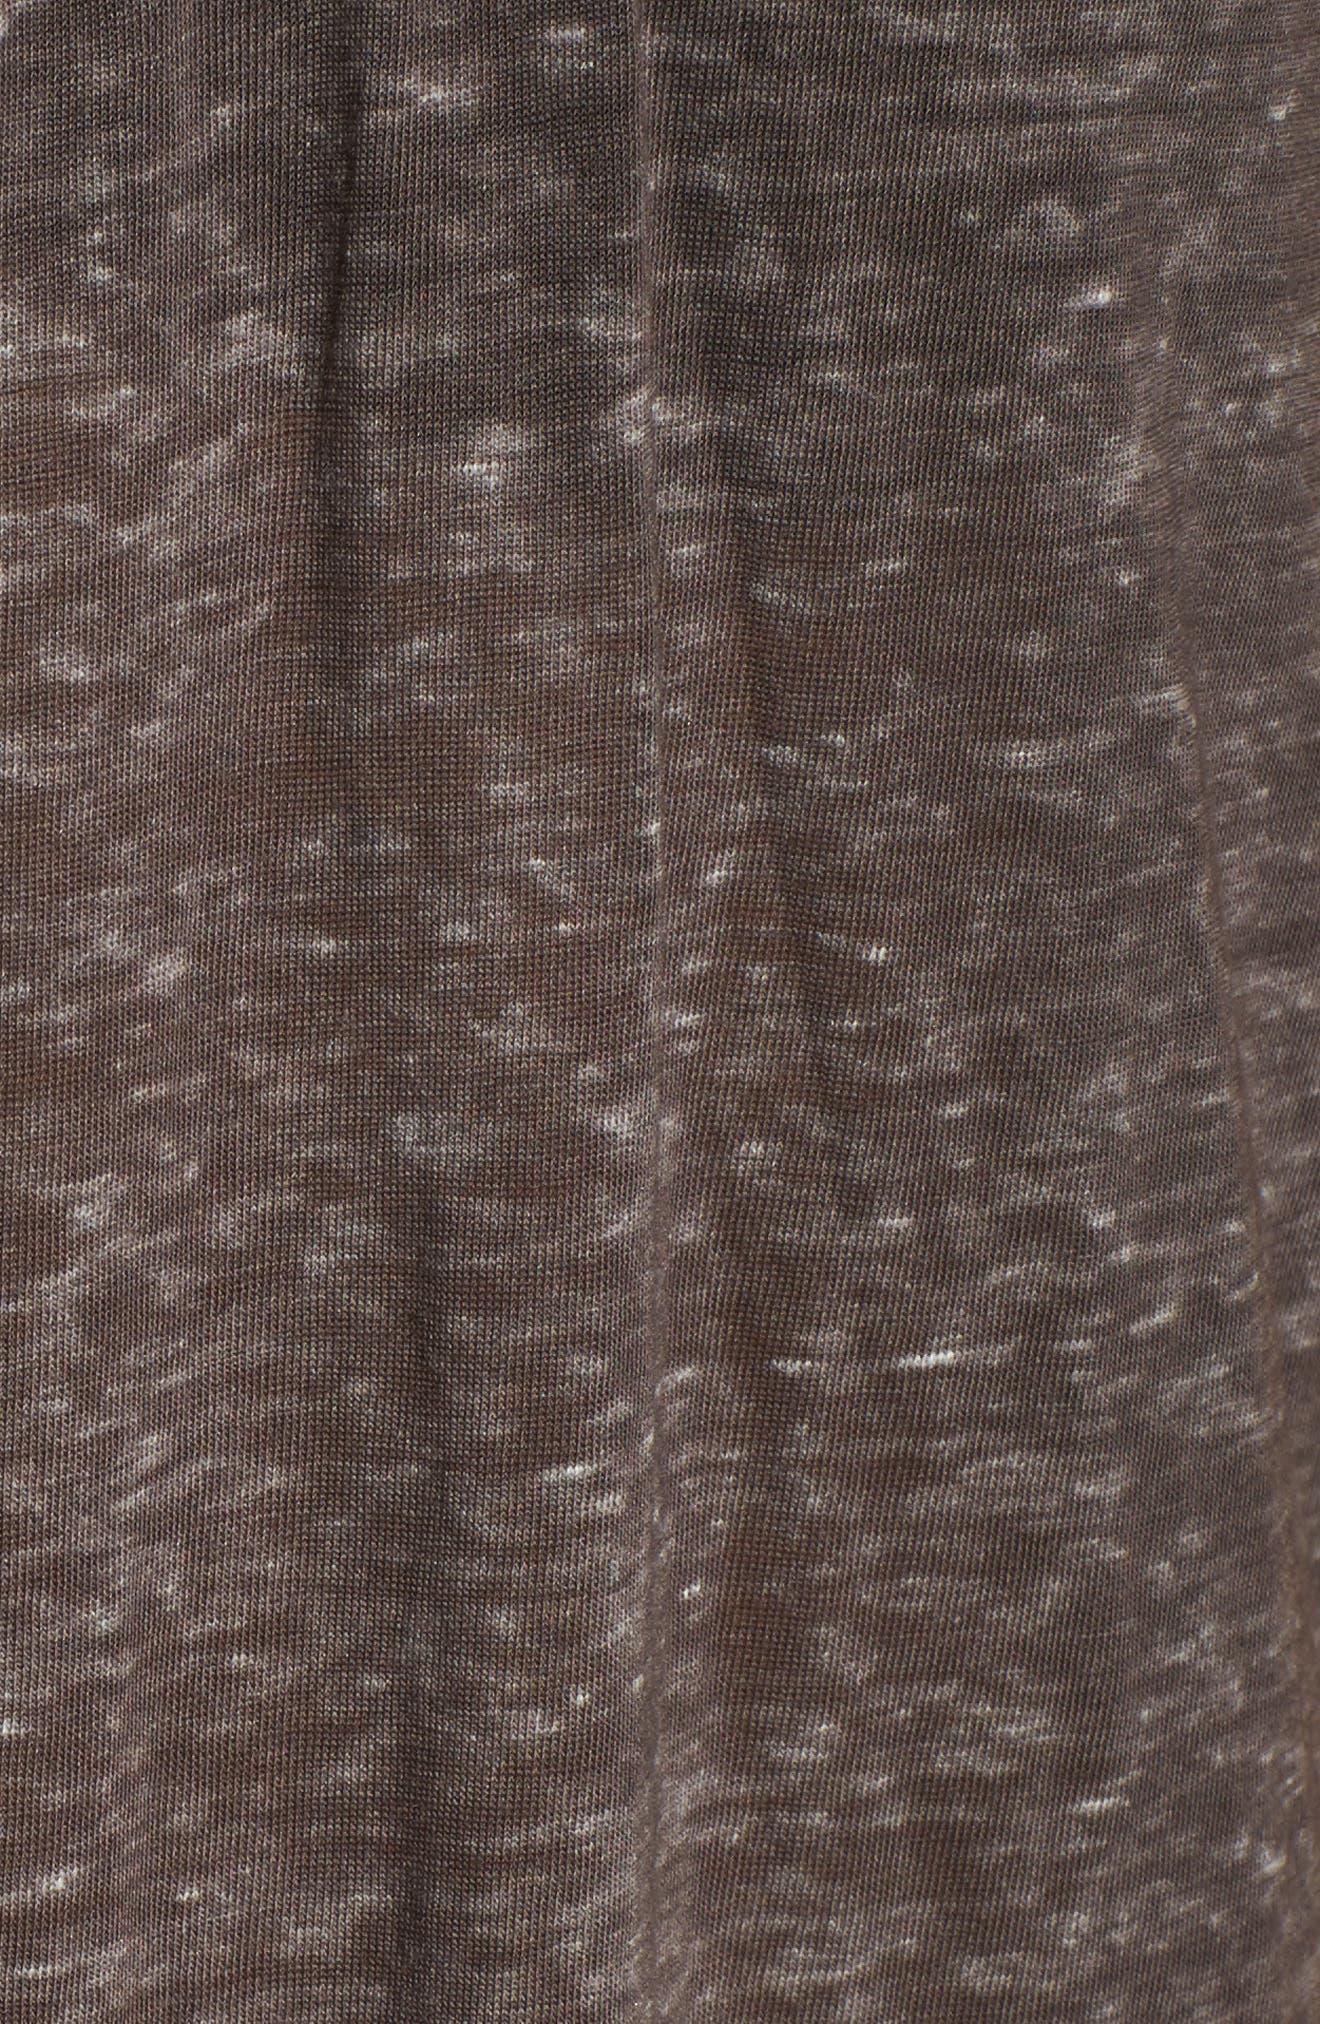 Maxi Cover-Up Dress,                             Alternate thumbnail 22, color,